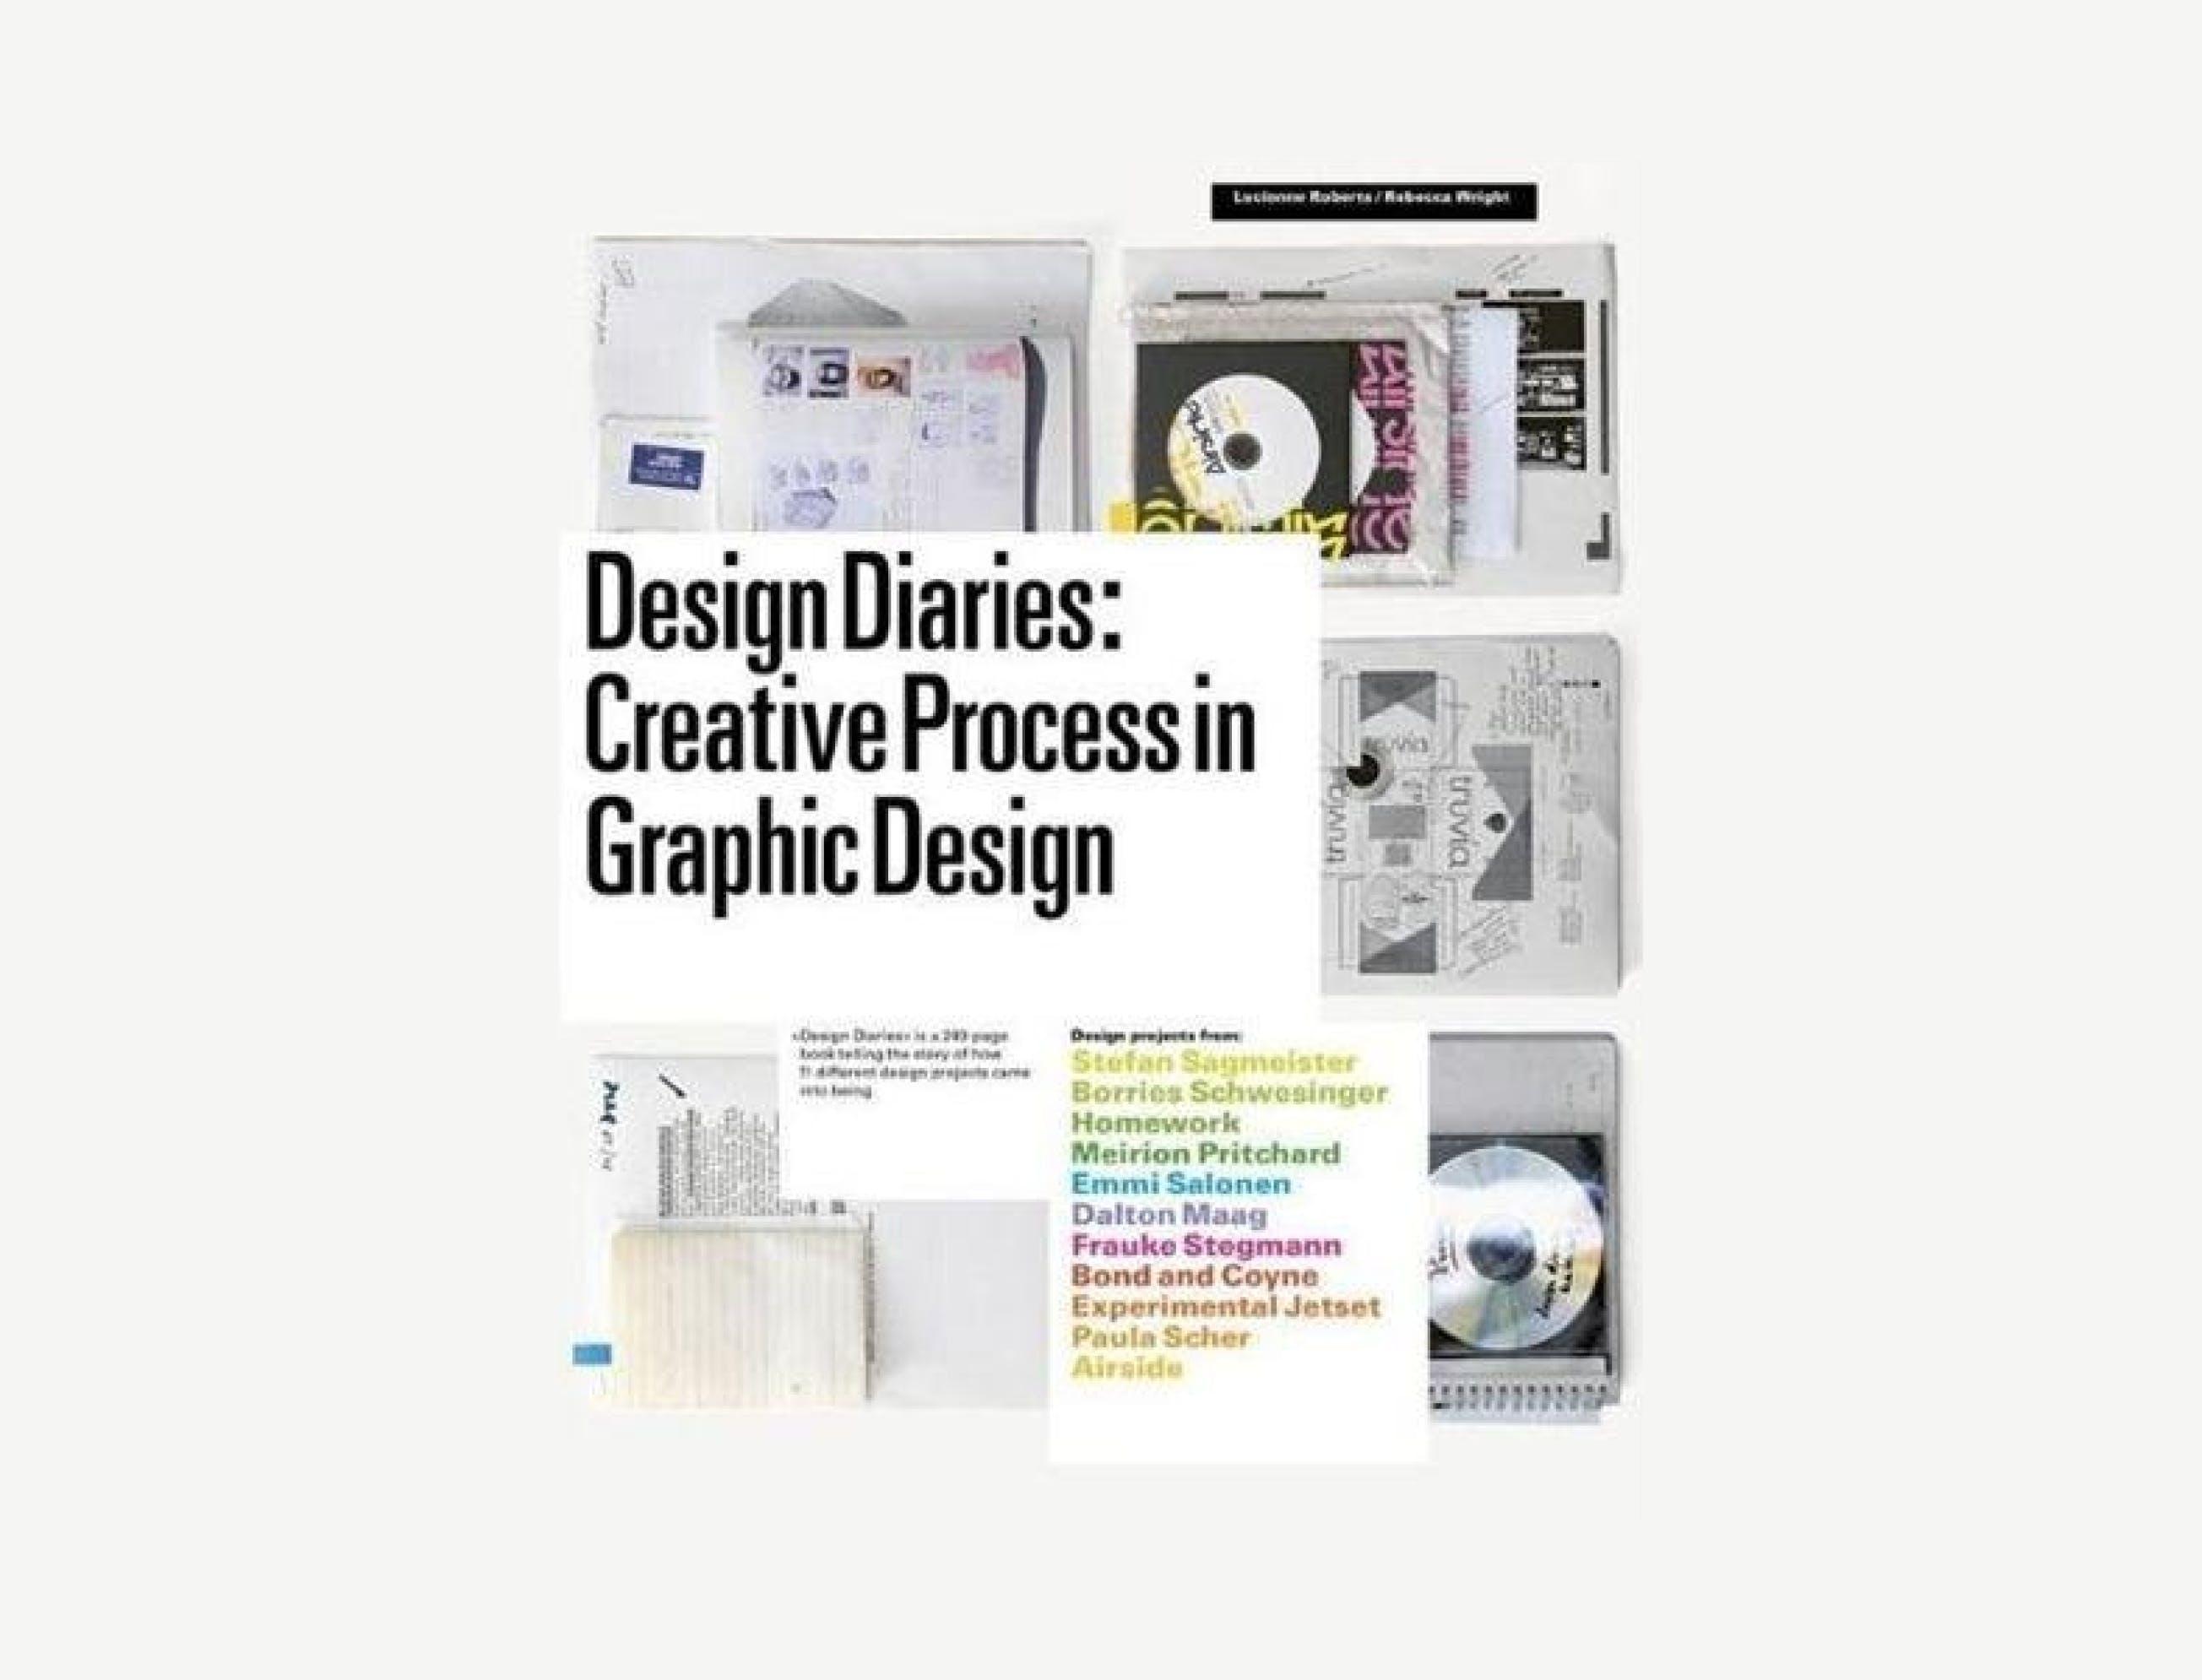 design diaries: creative process in graphic design book